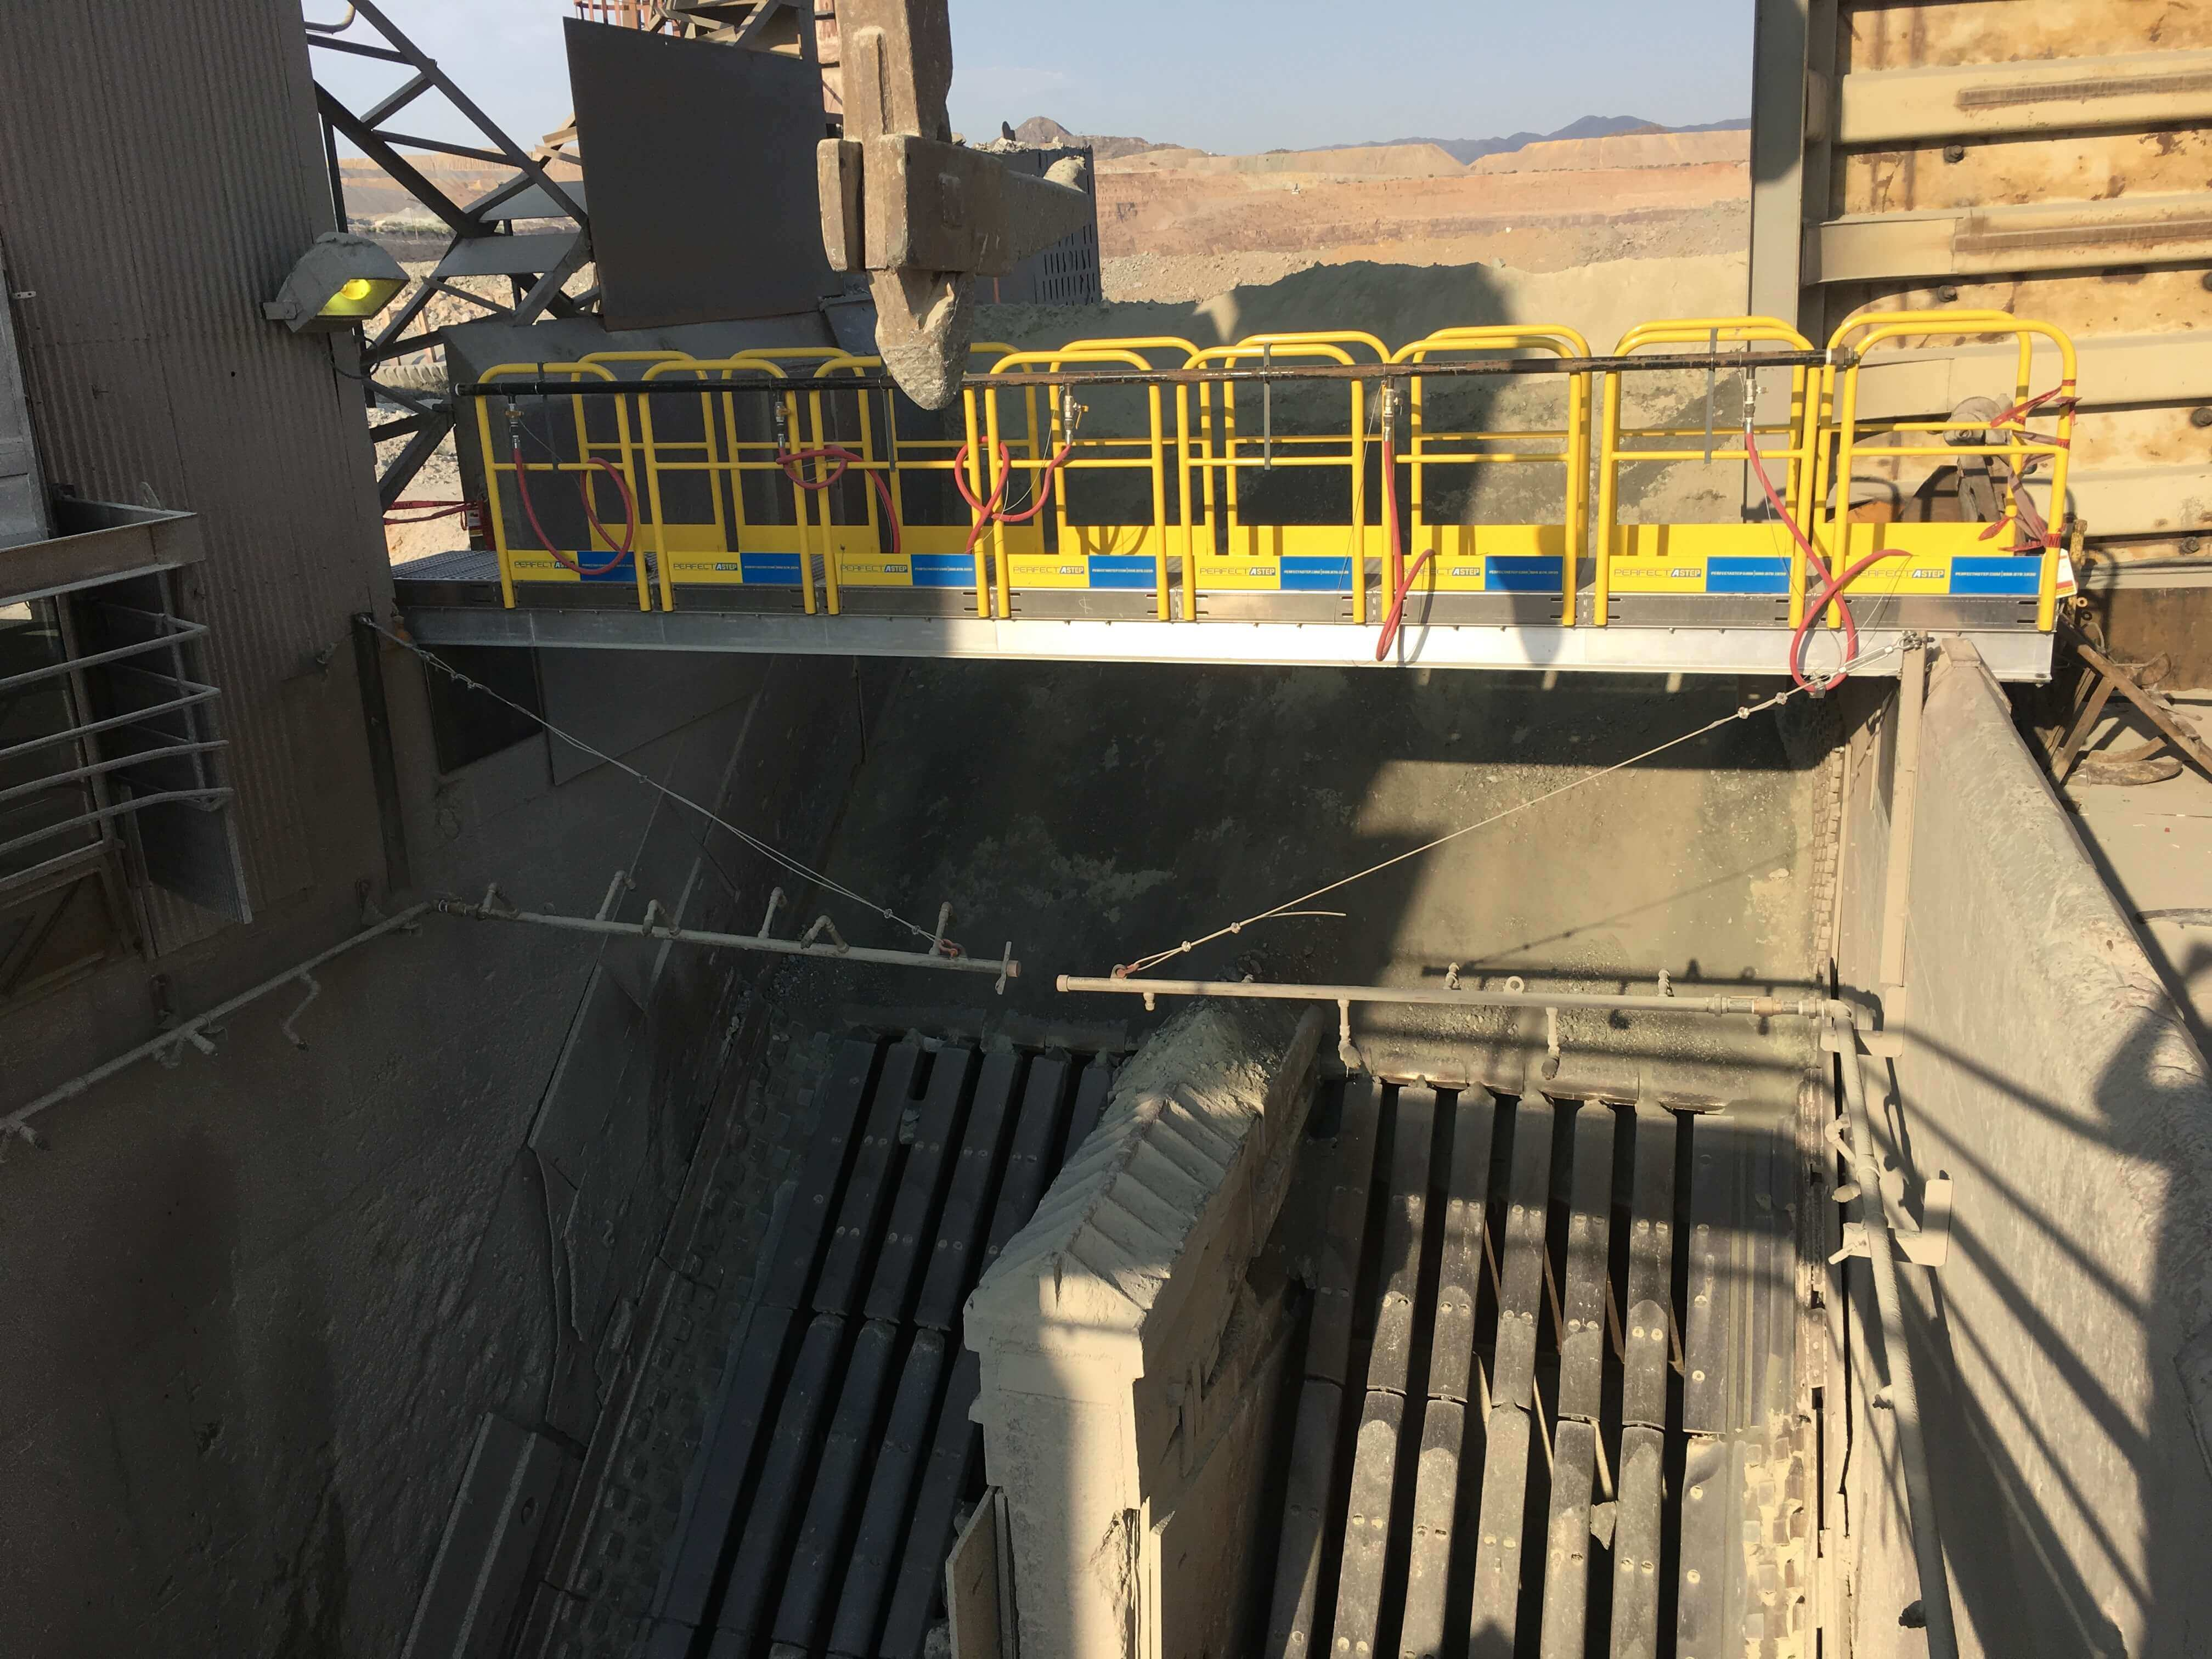 Metal Bridge with Metal Railings